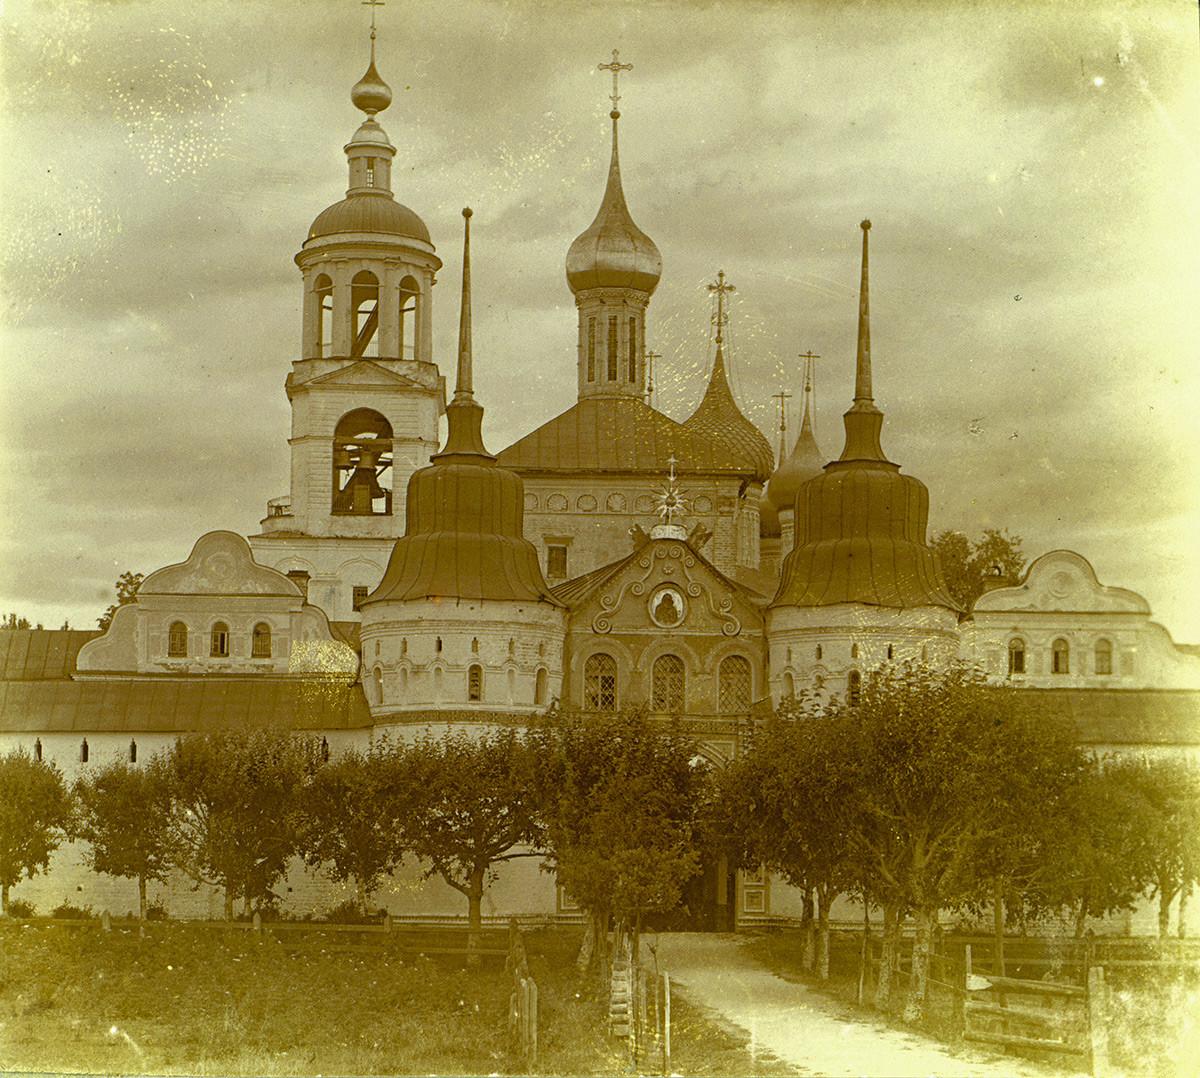 Puerta Santa e Iglesia de San Nicolás. Vista oeste. 1910